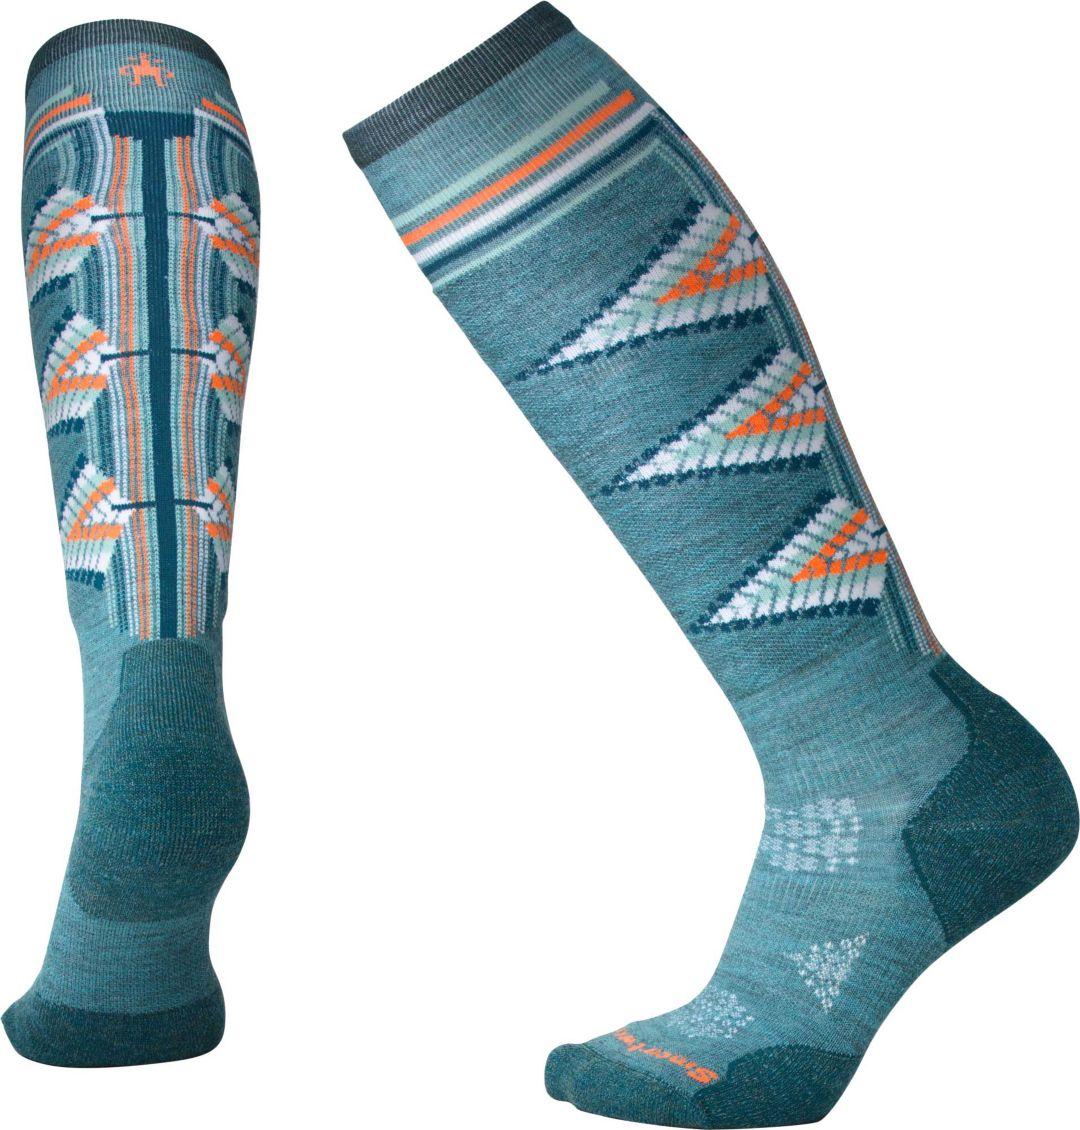 911298dc2874b Smartwool Women's PhD Ski Light Pattern Socks | DICK'S Sporting Goods